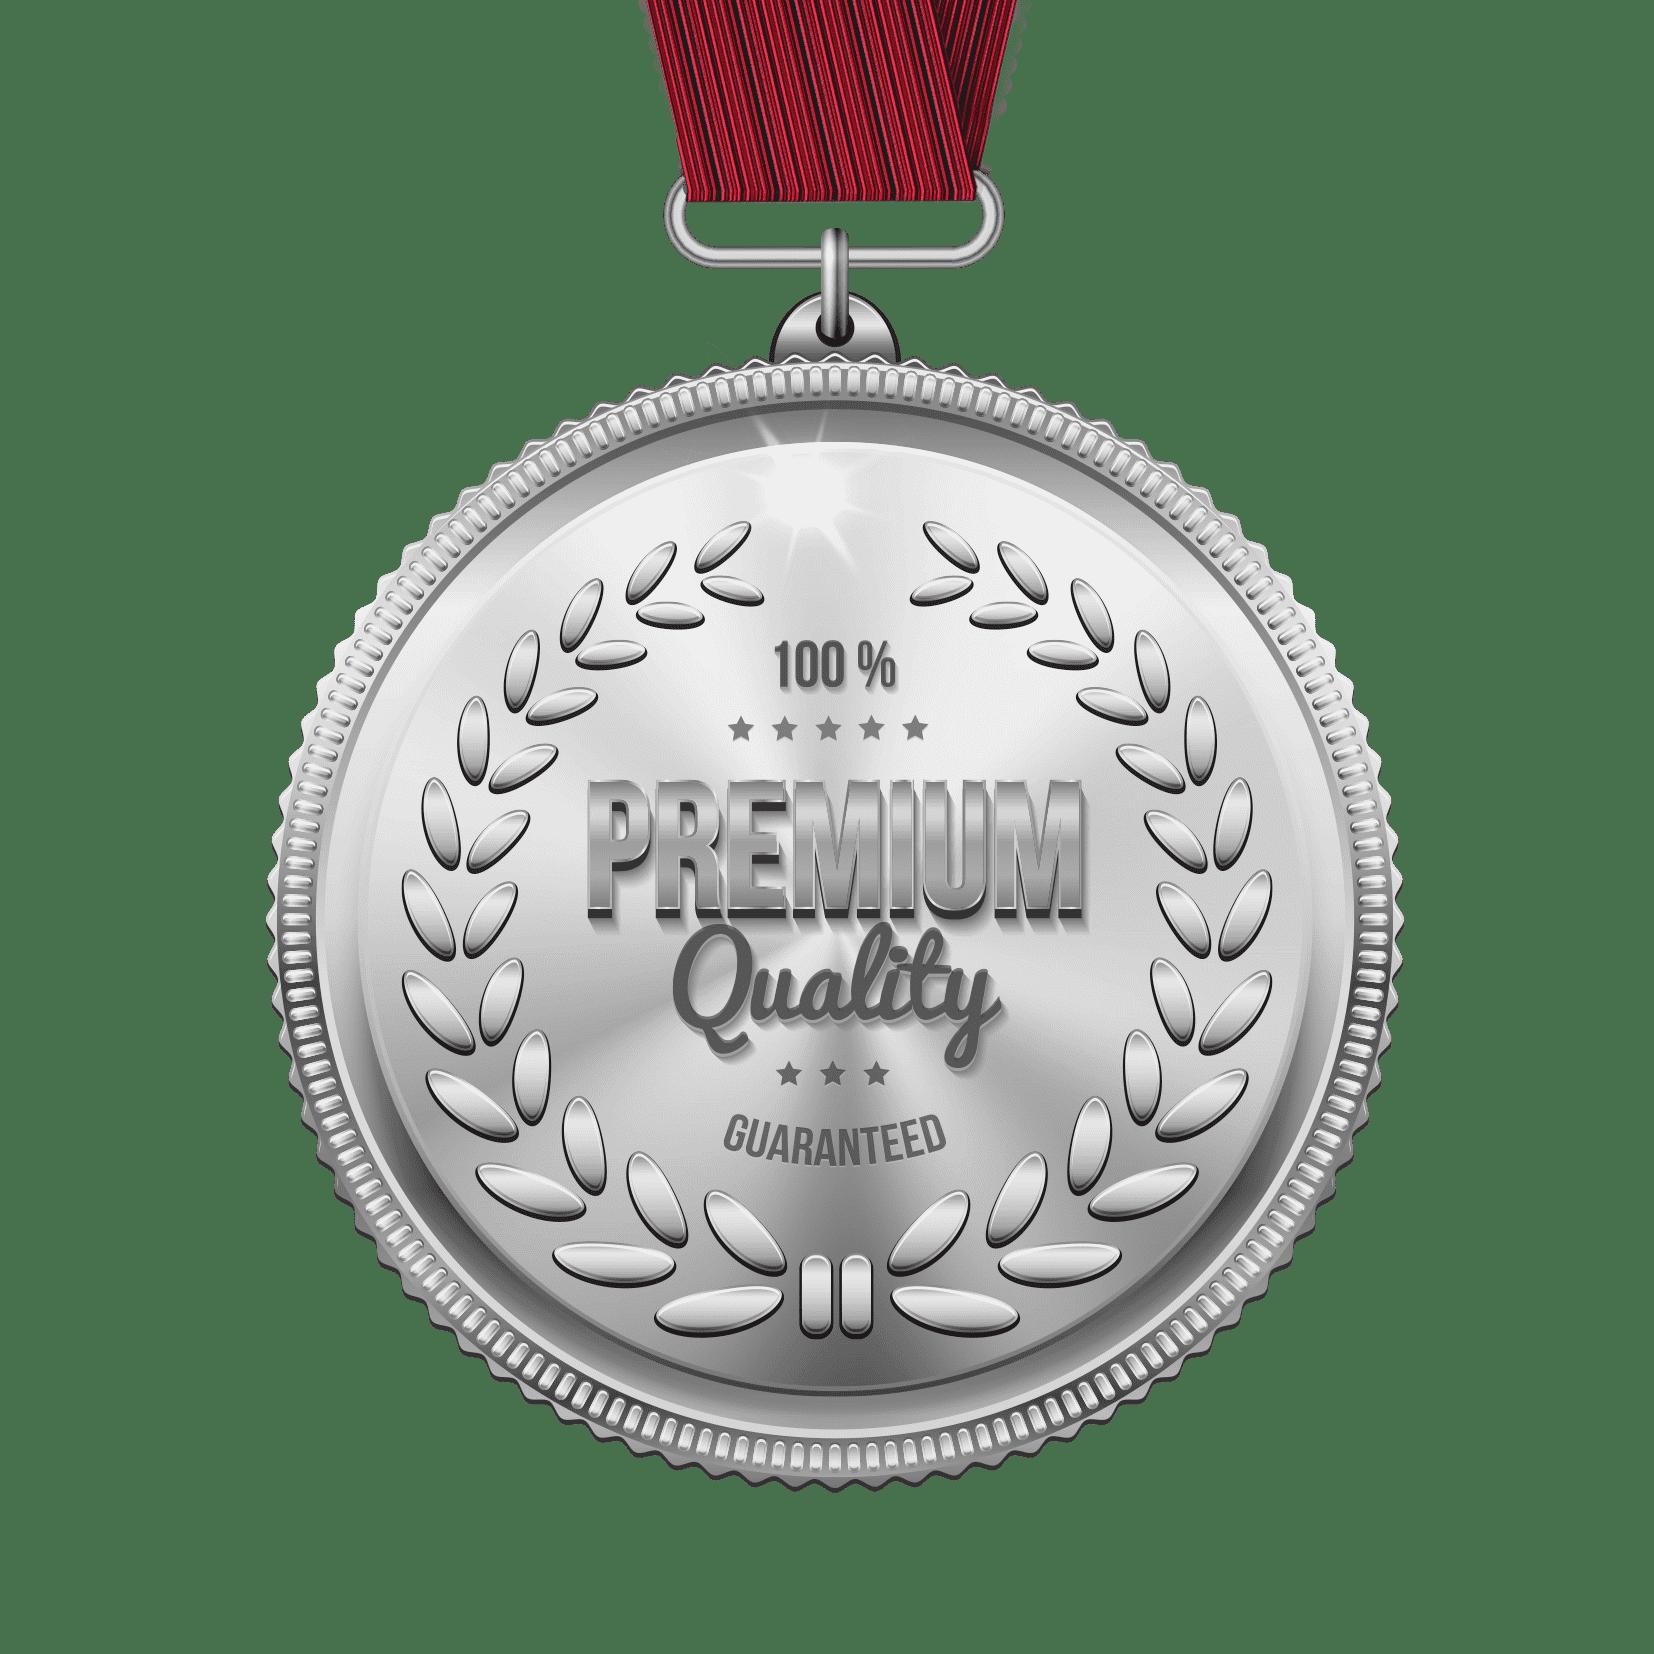 High Polish Silver Medal